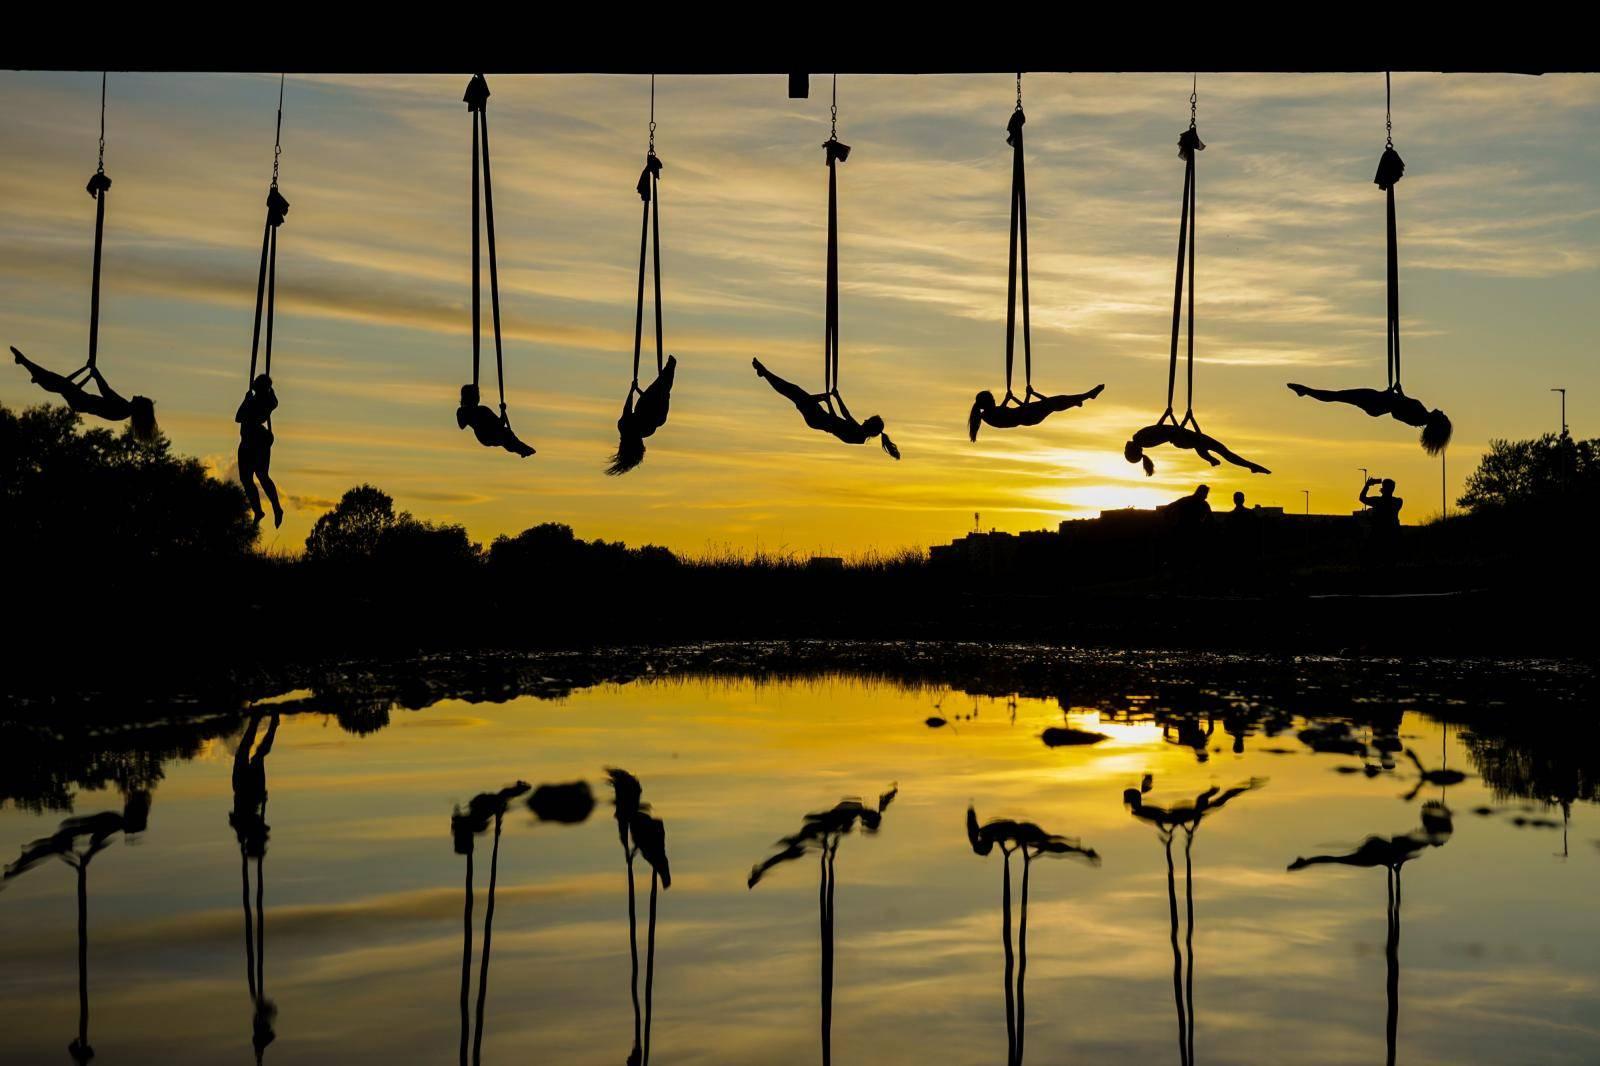 Čarobni ples na svili: Predivne siluete ispod mosta Mladosti